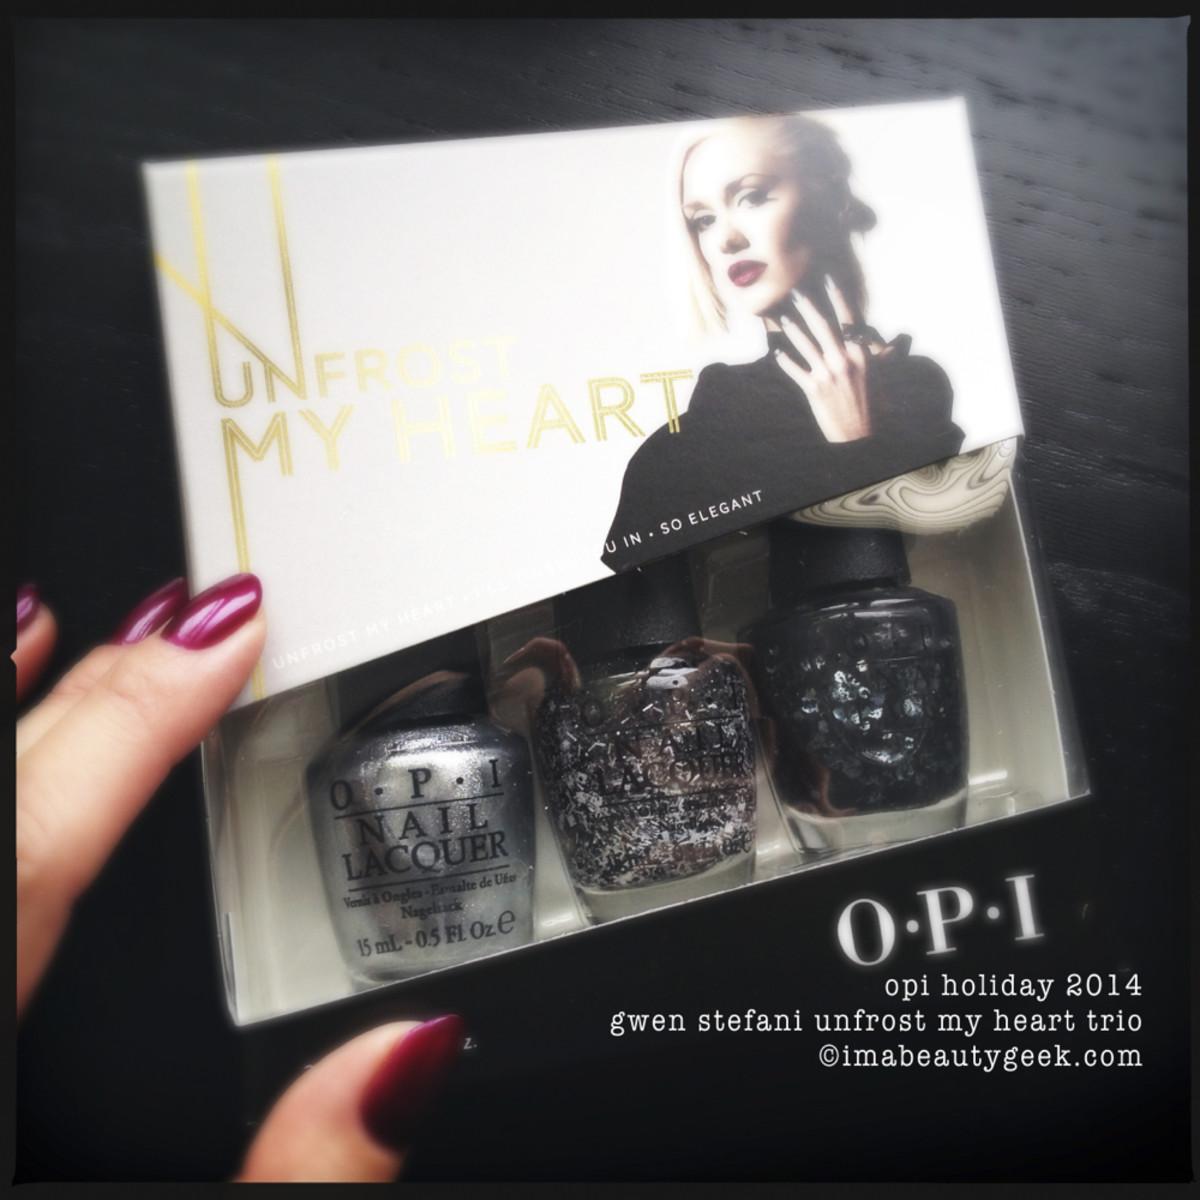 OPI Holiday 2014 Gwen Stefani Unfrost My Heart Trio